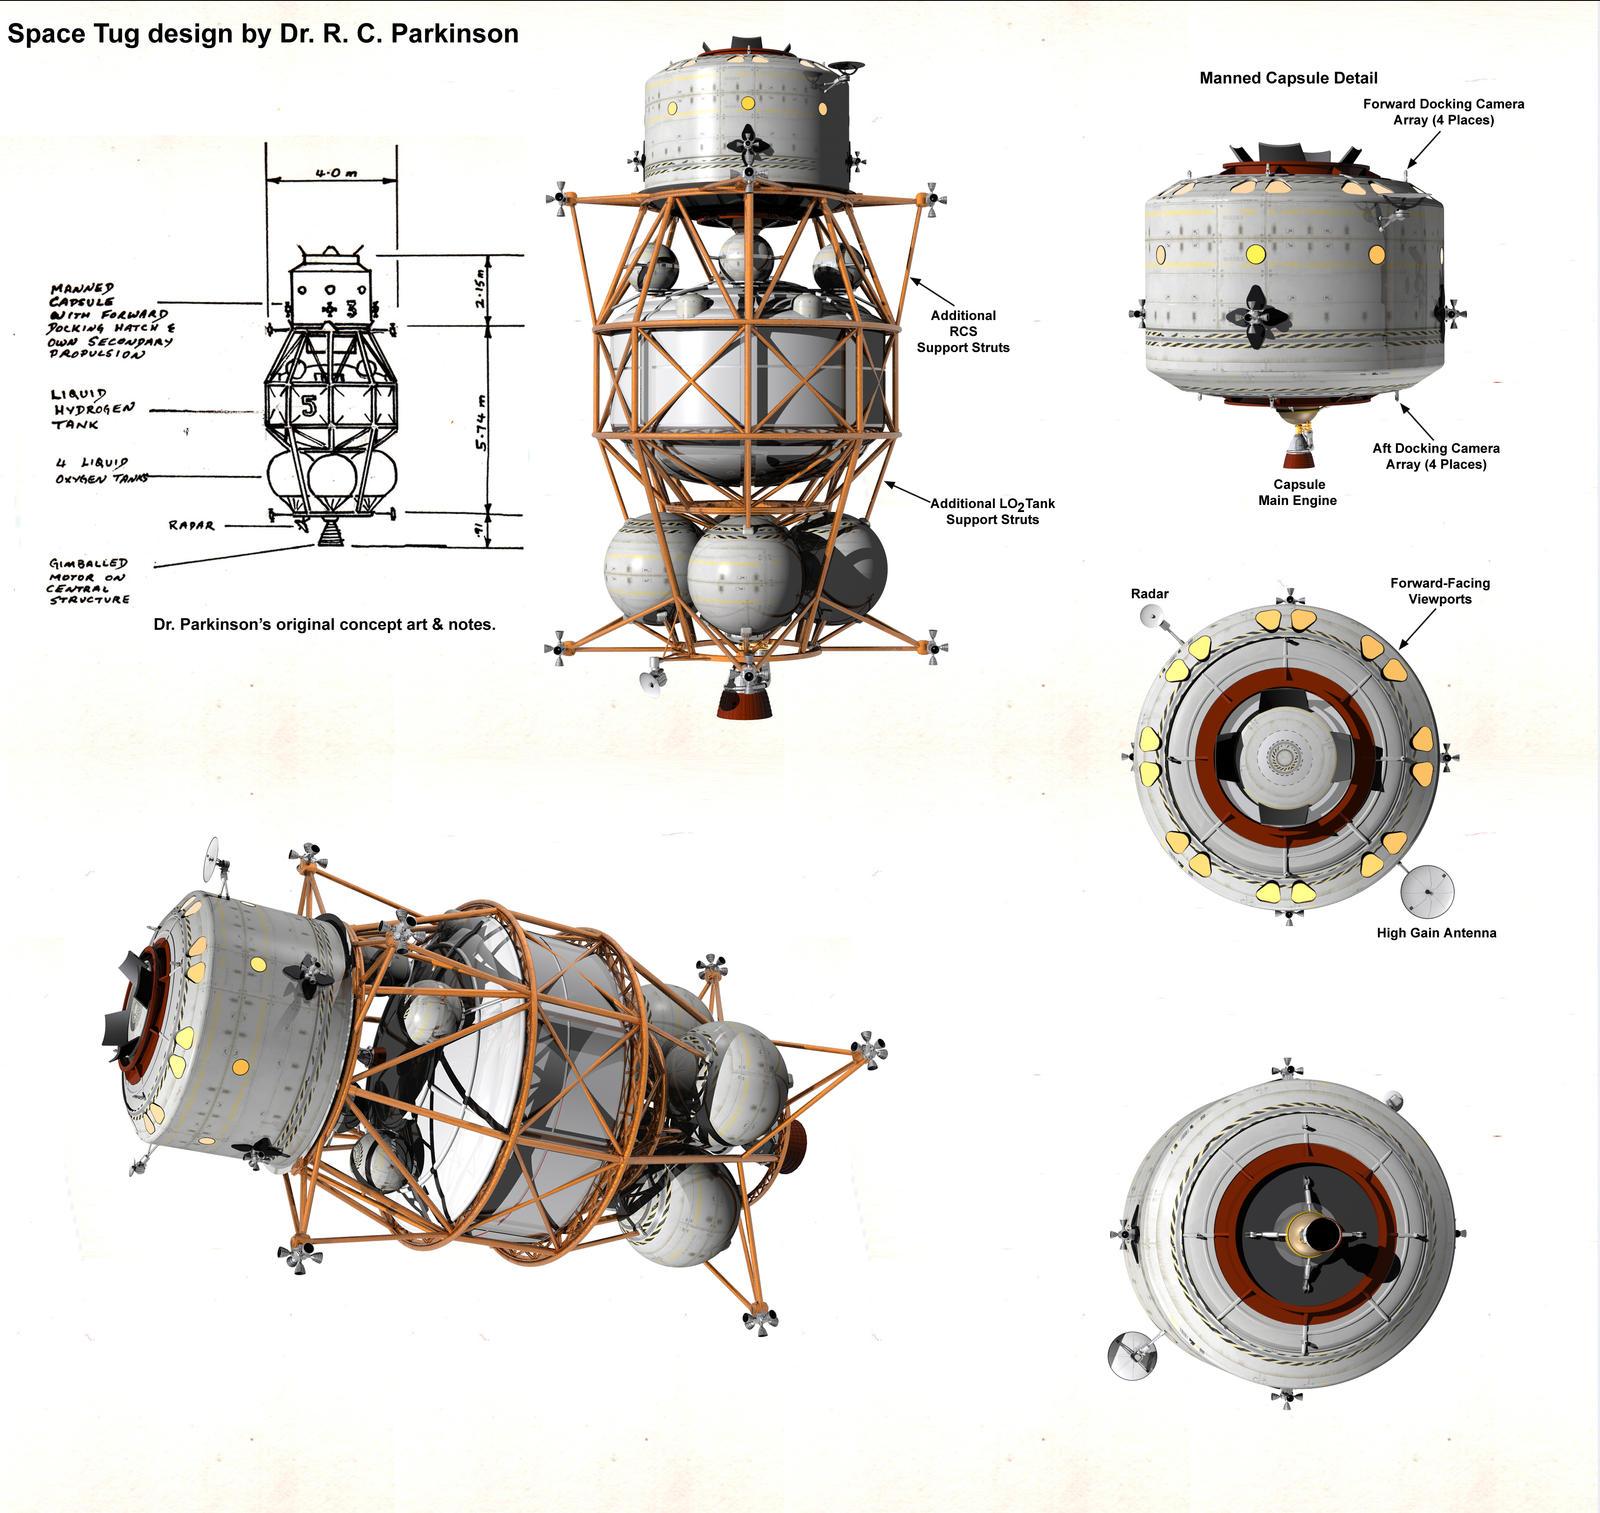 Dr. R. C. Parkinson Space Tug by William-Black